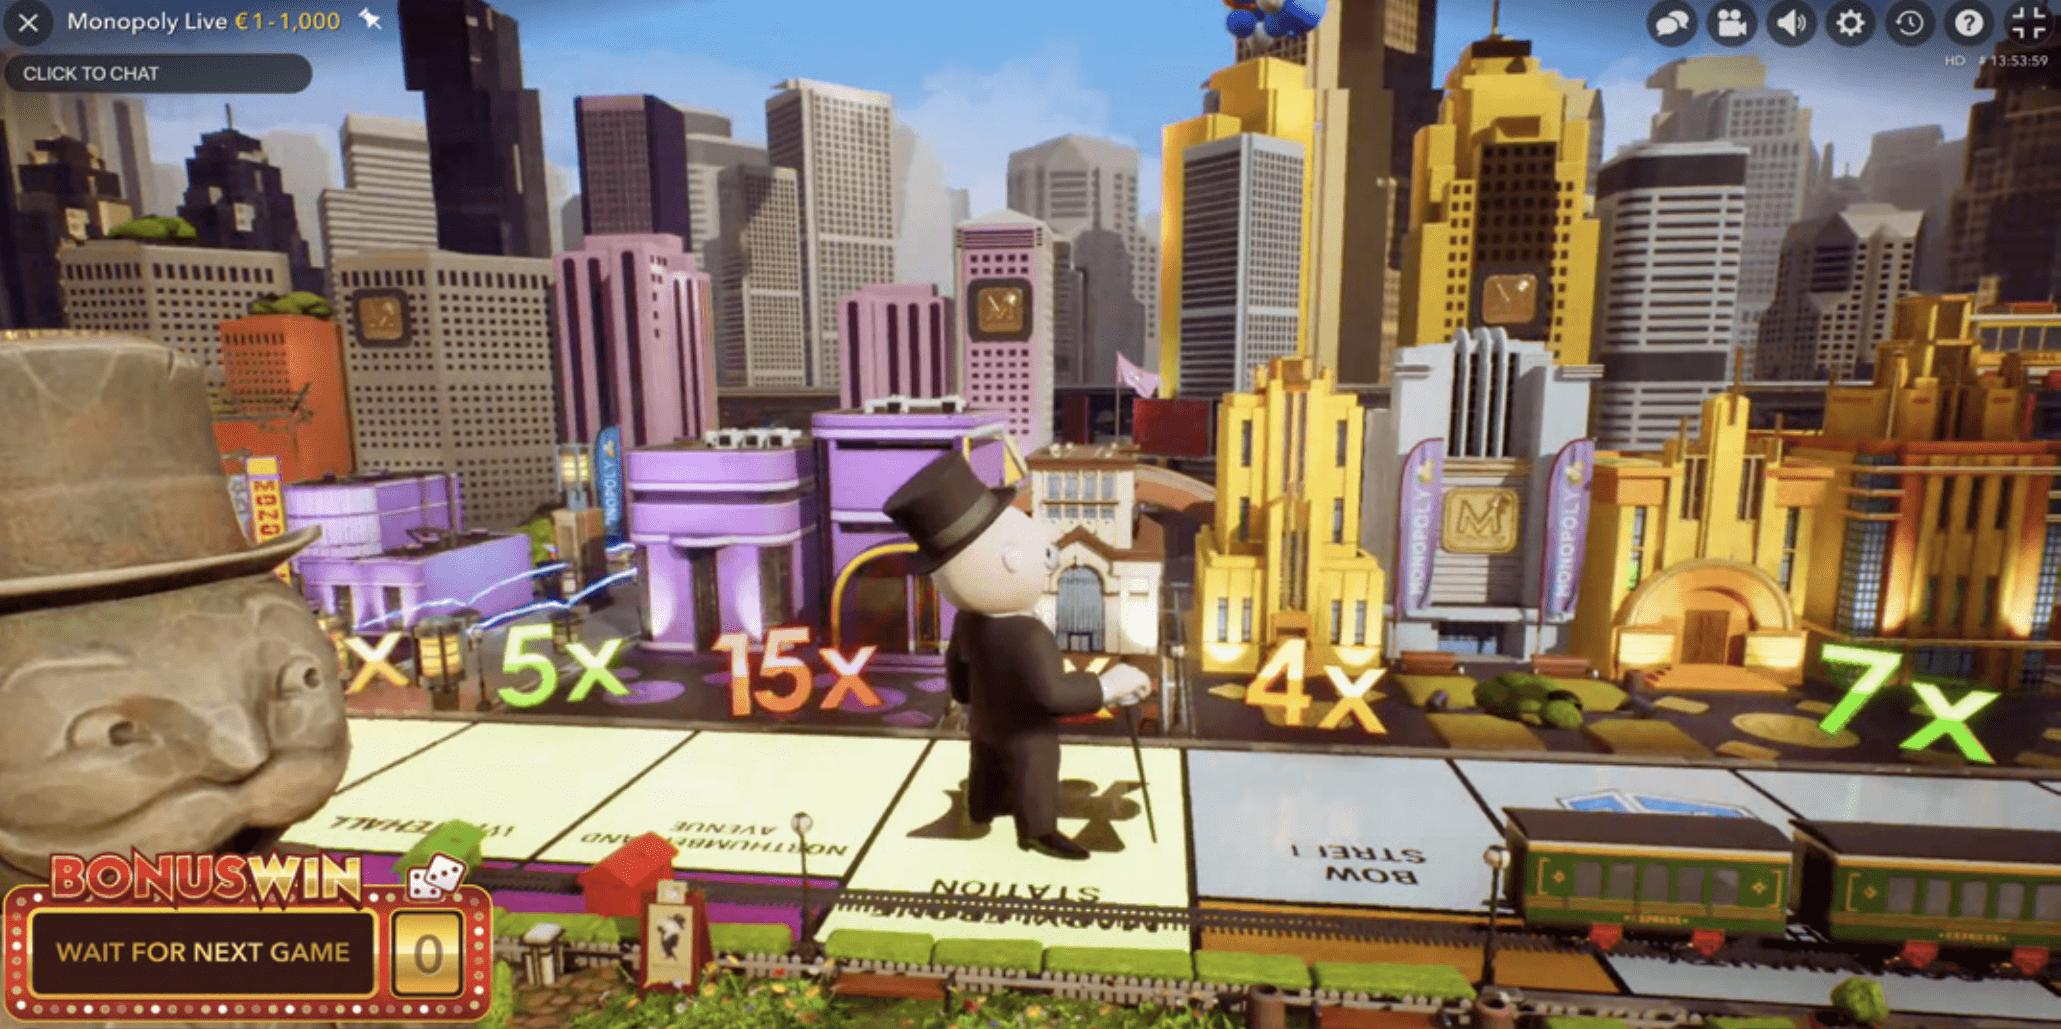 Screenshot of Mr.Monopoly walking on the bonus round board